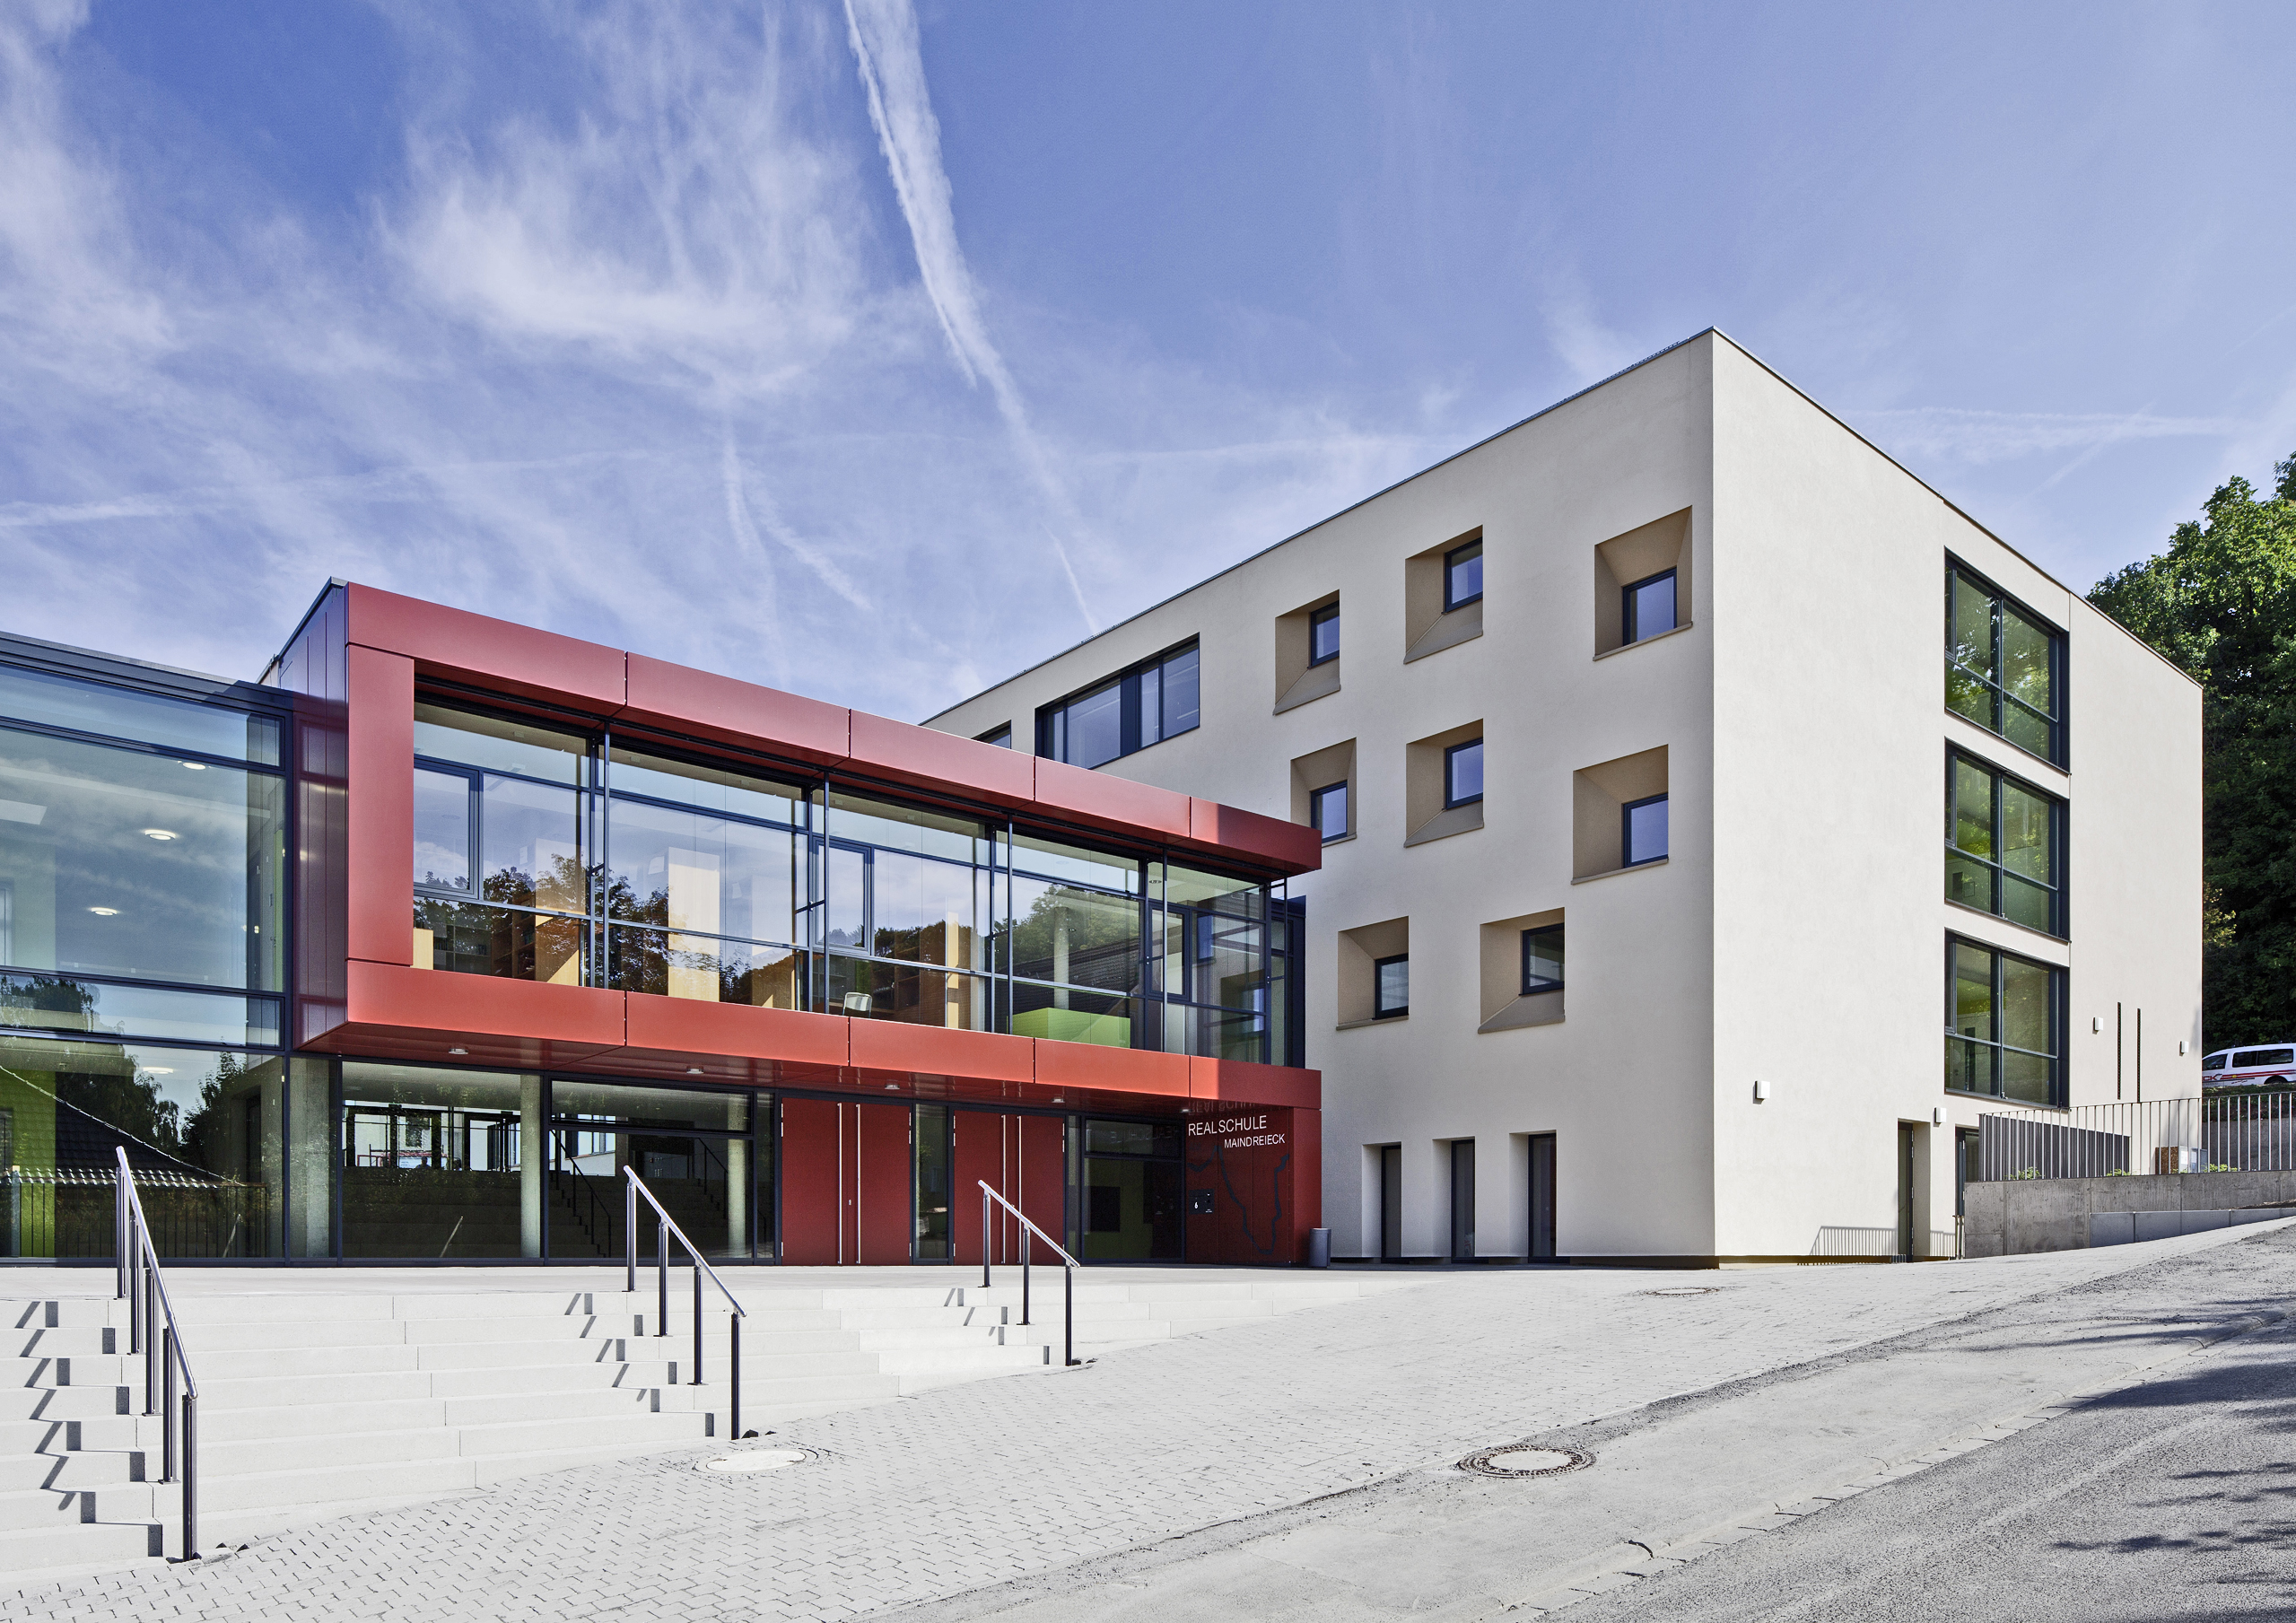 https://www.architektur-fassade.de/wp-content/uploads/2021/02/10501_RSOchsenfurt01.jpg